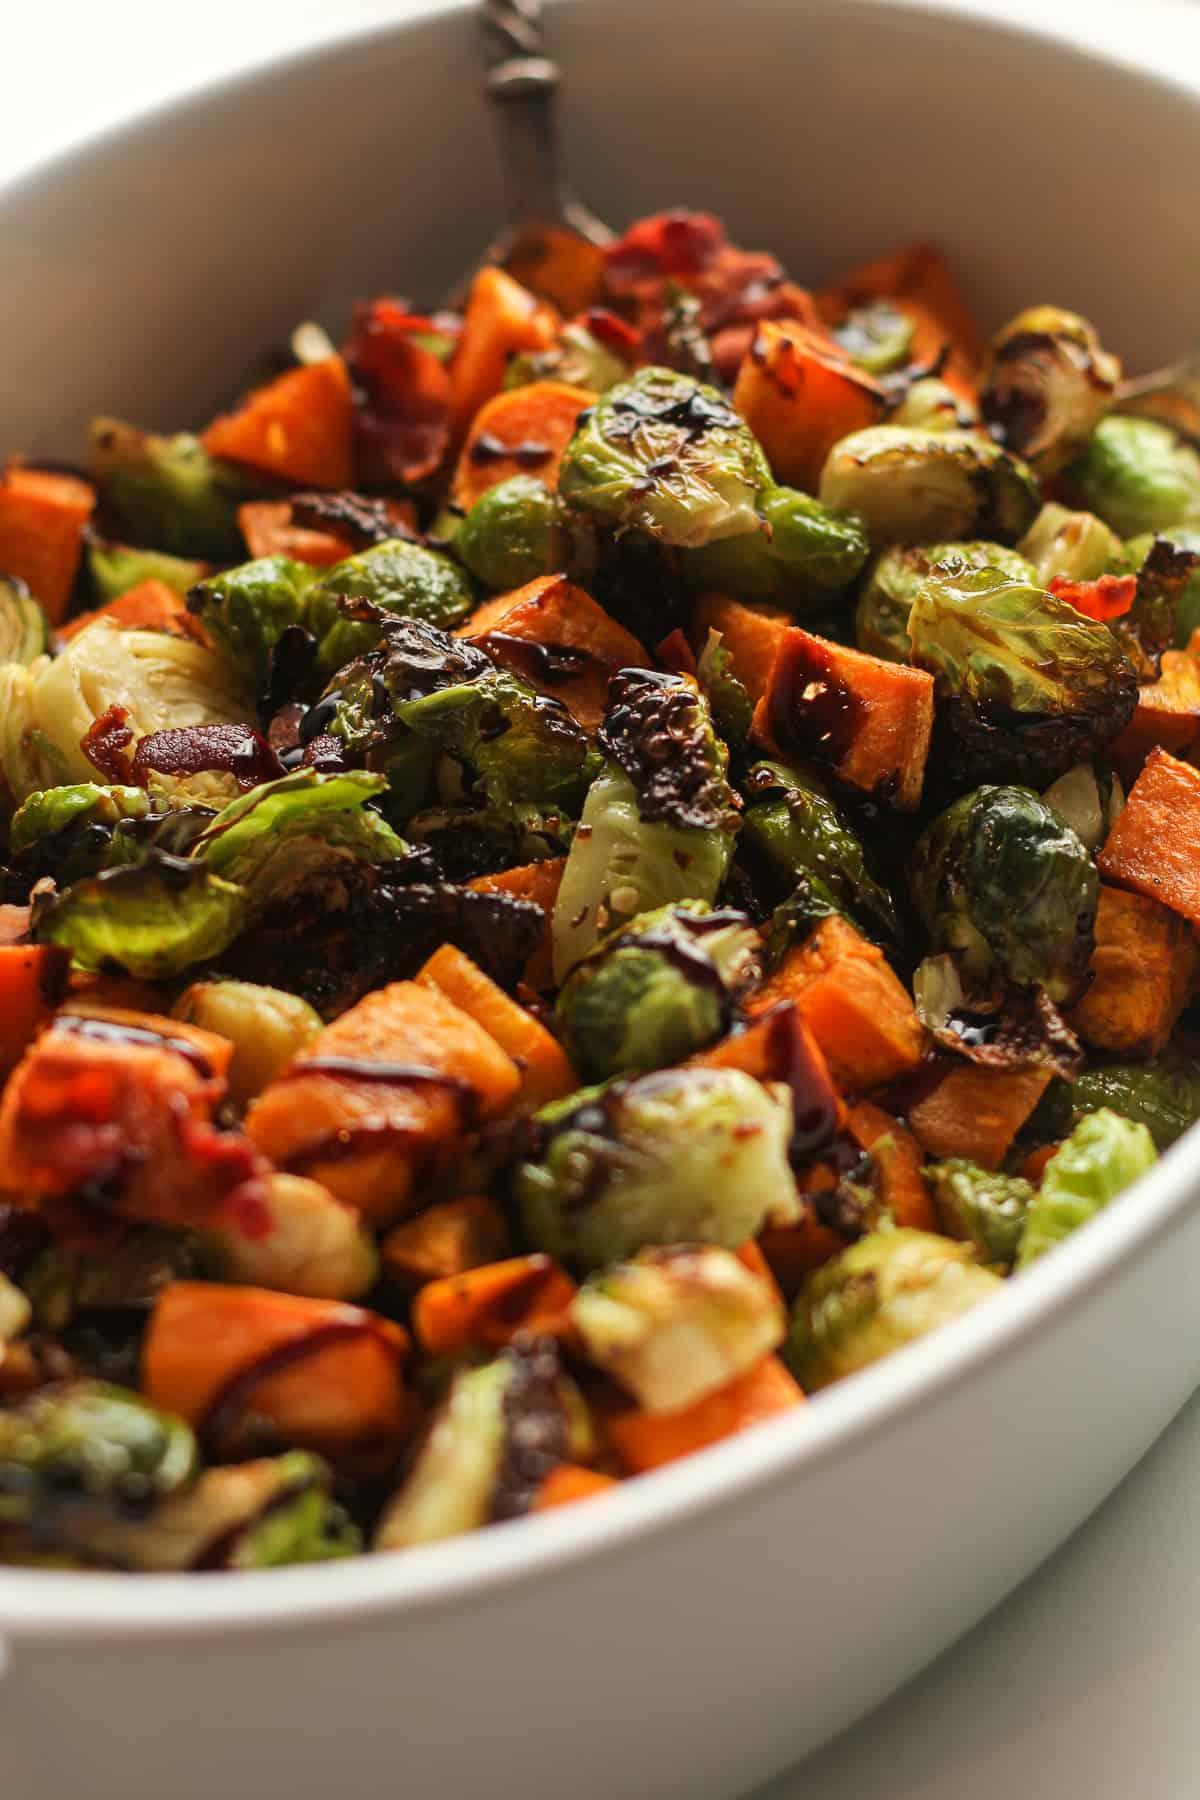 The glazed veggies in a dish.